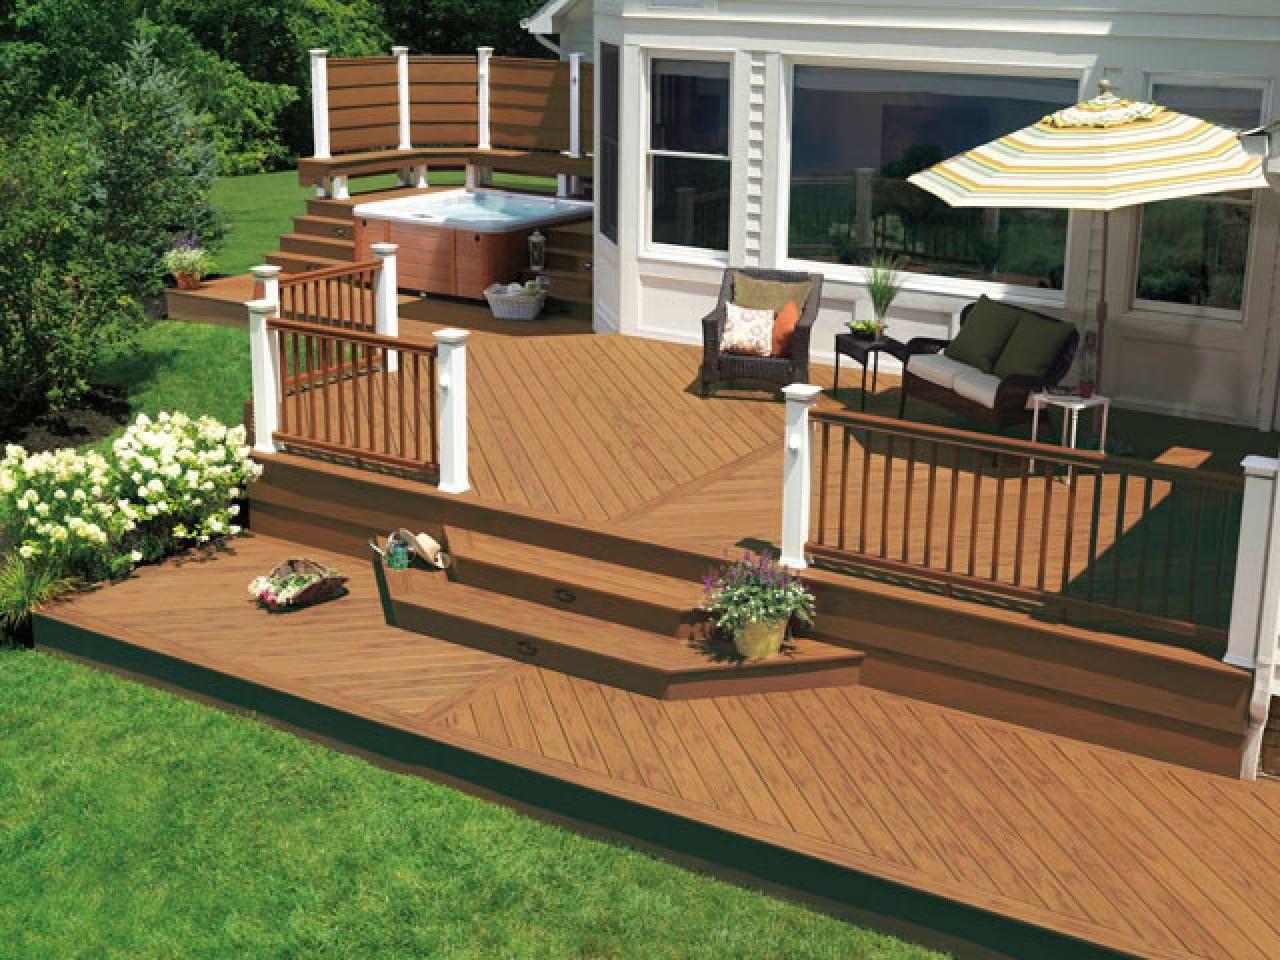 Designer Decks Made From Natural Wood, Composite and Aluminum | Deck ...